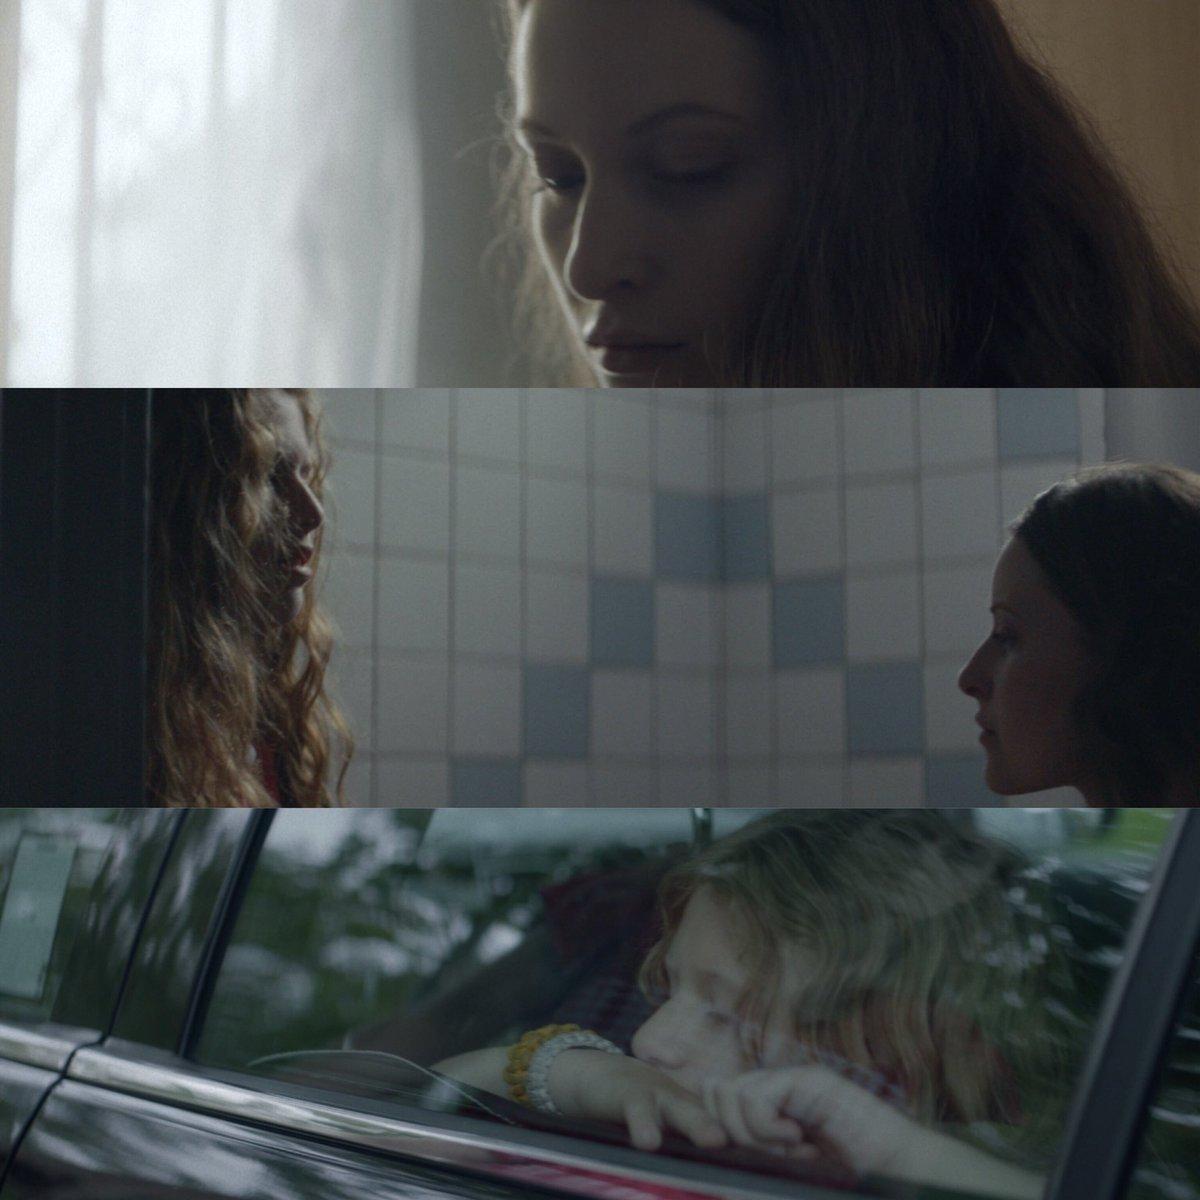 Love these stills from our upcoming film, #Lullaby! : Frances Kroon. #filmmaking #womeninfilm #filmfestival<br>http://pic.twitter.com/JBtPCJxQCR